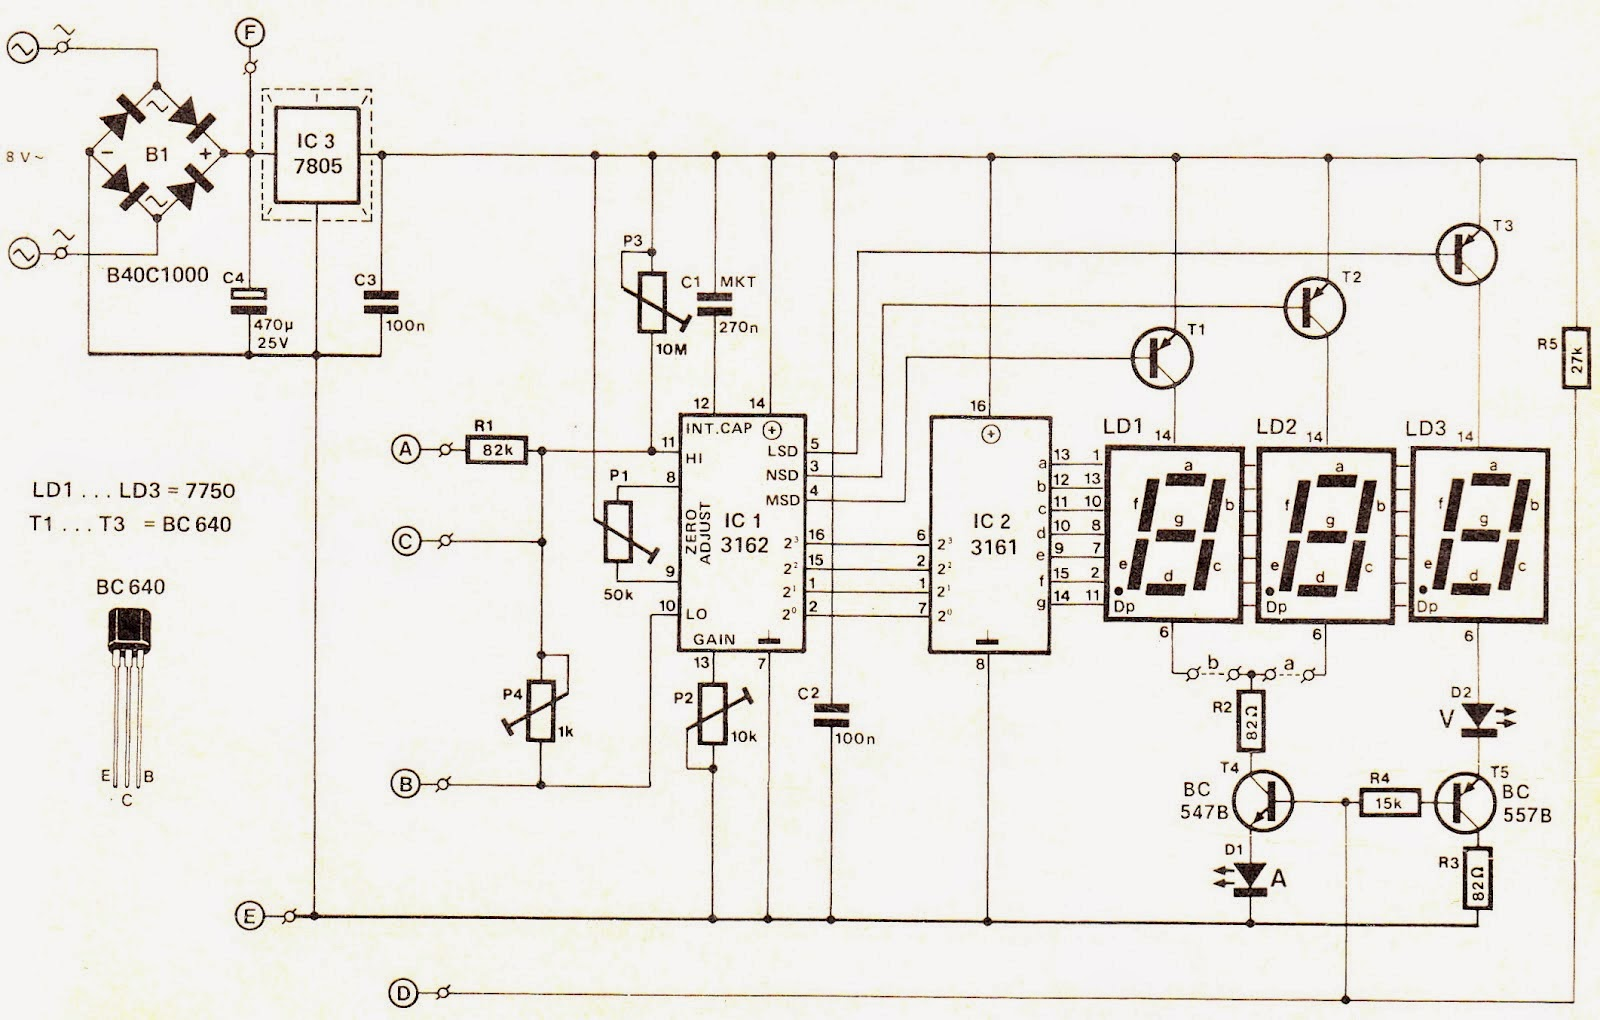 ammeter gauge wiring diagram mercedes diagrams schematics digital voltmeter and circuit module expert circuits